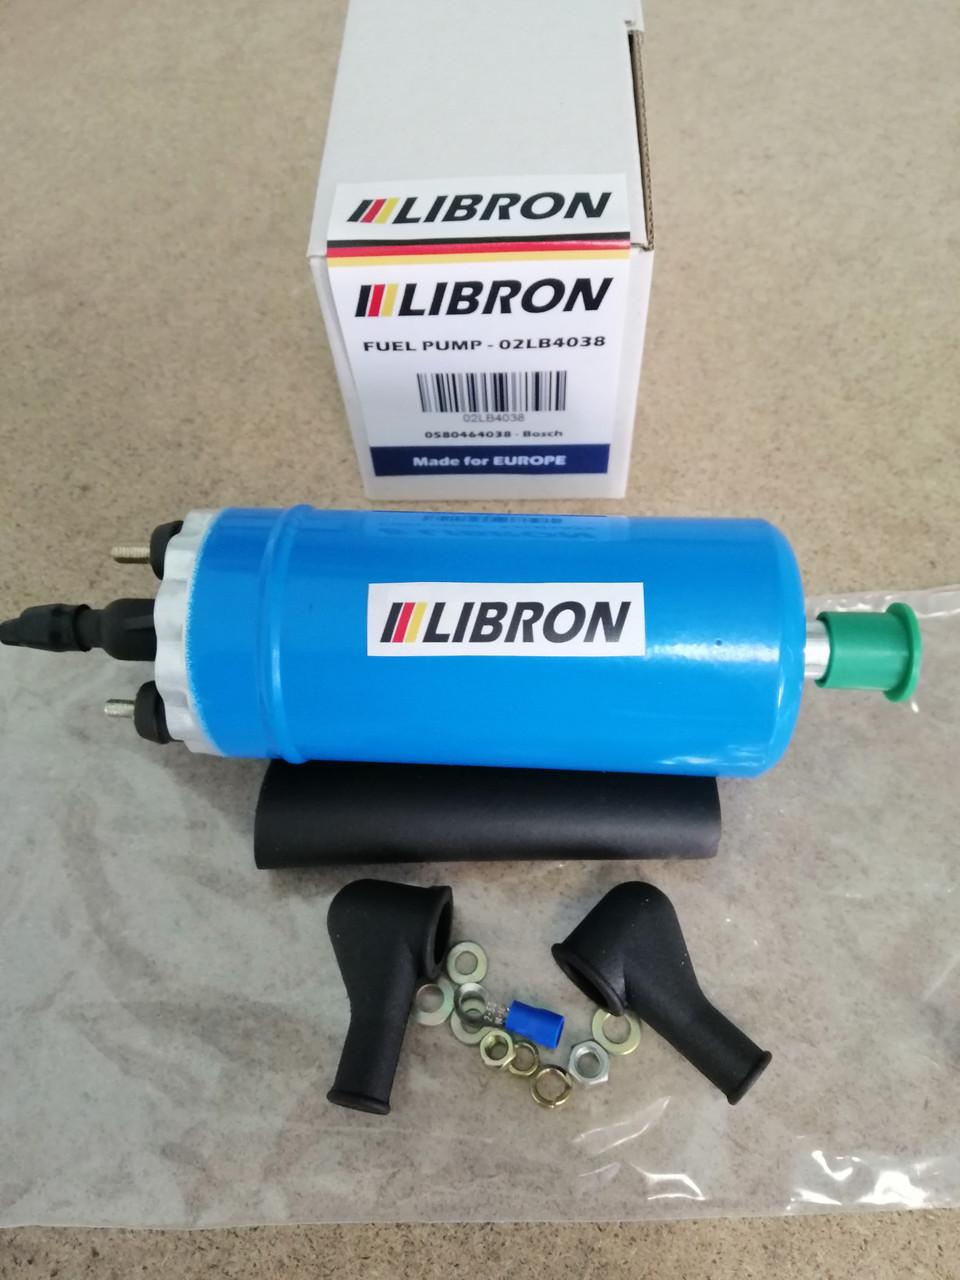 Топливный насос LIBRON 02LB4038 - ROVER MONTEGO Break (XE) 2.0 GTi (1988-1991)